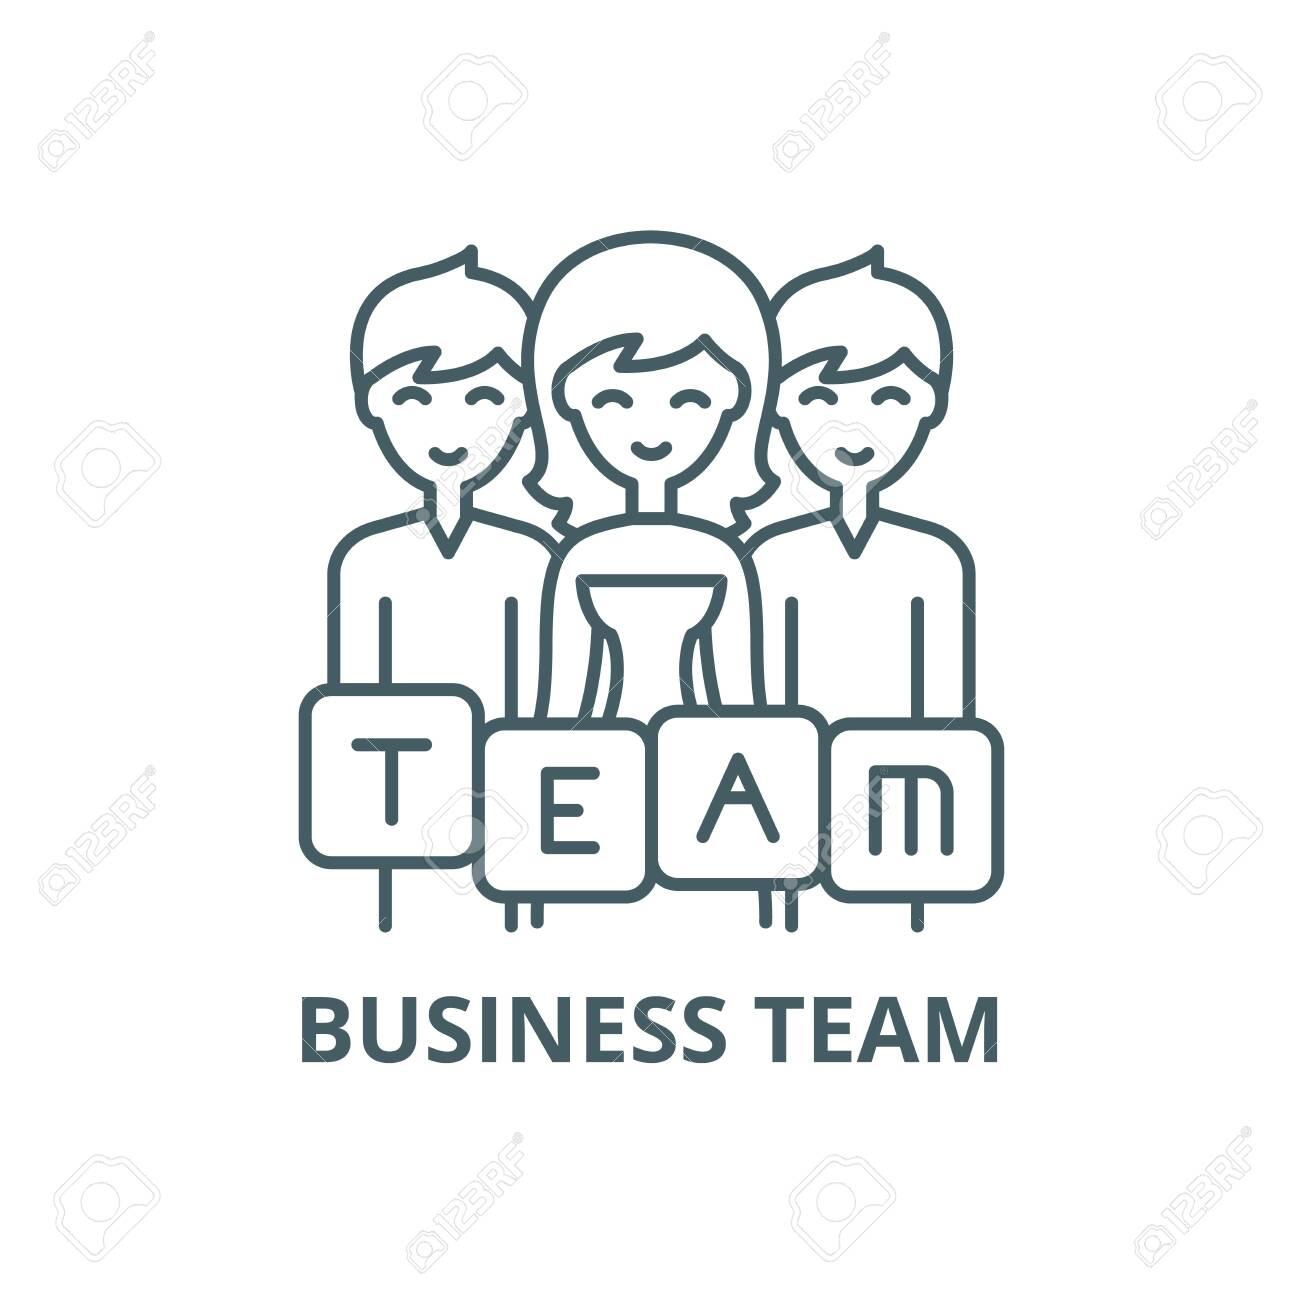 Business team line icon, vector. Business team outline sign, concept symbol, illustration - 123749538